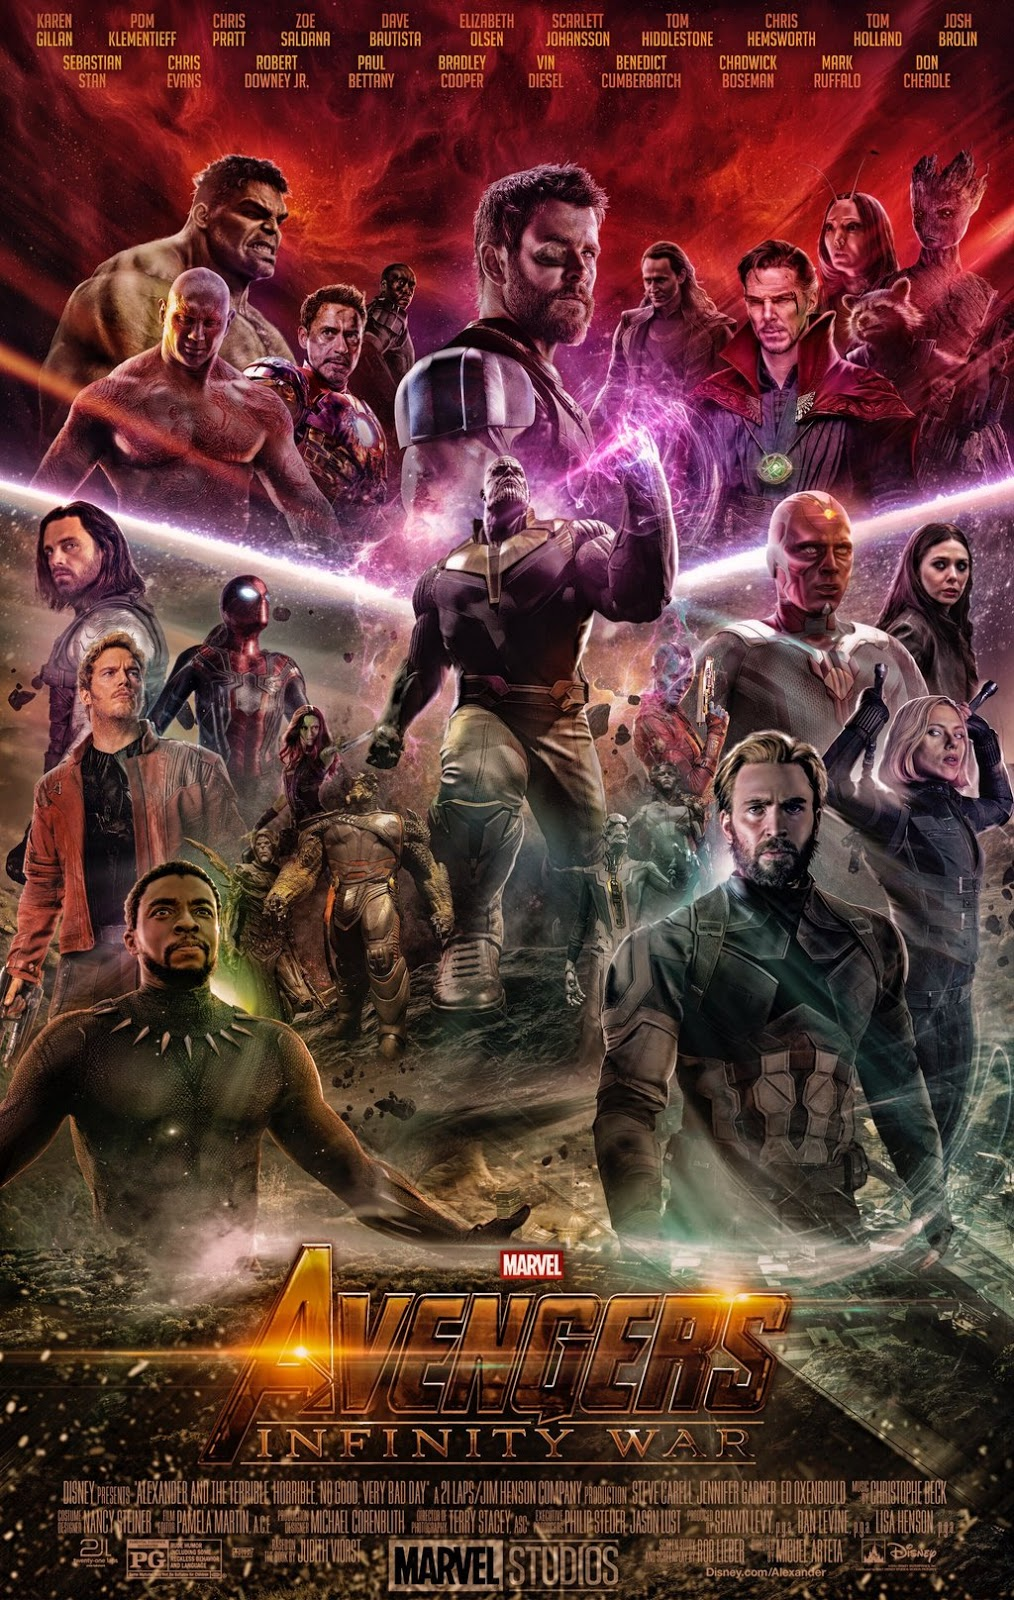 Avengers Infinity War Web Dl : avengers, infinity, Avengers, Infinity, (2018), WEB-DL, 5.1-24HD